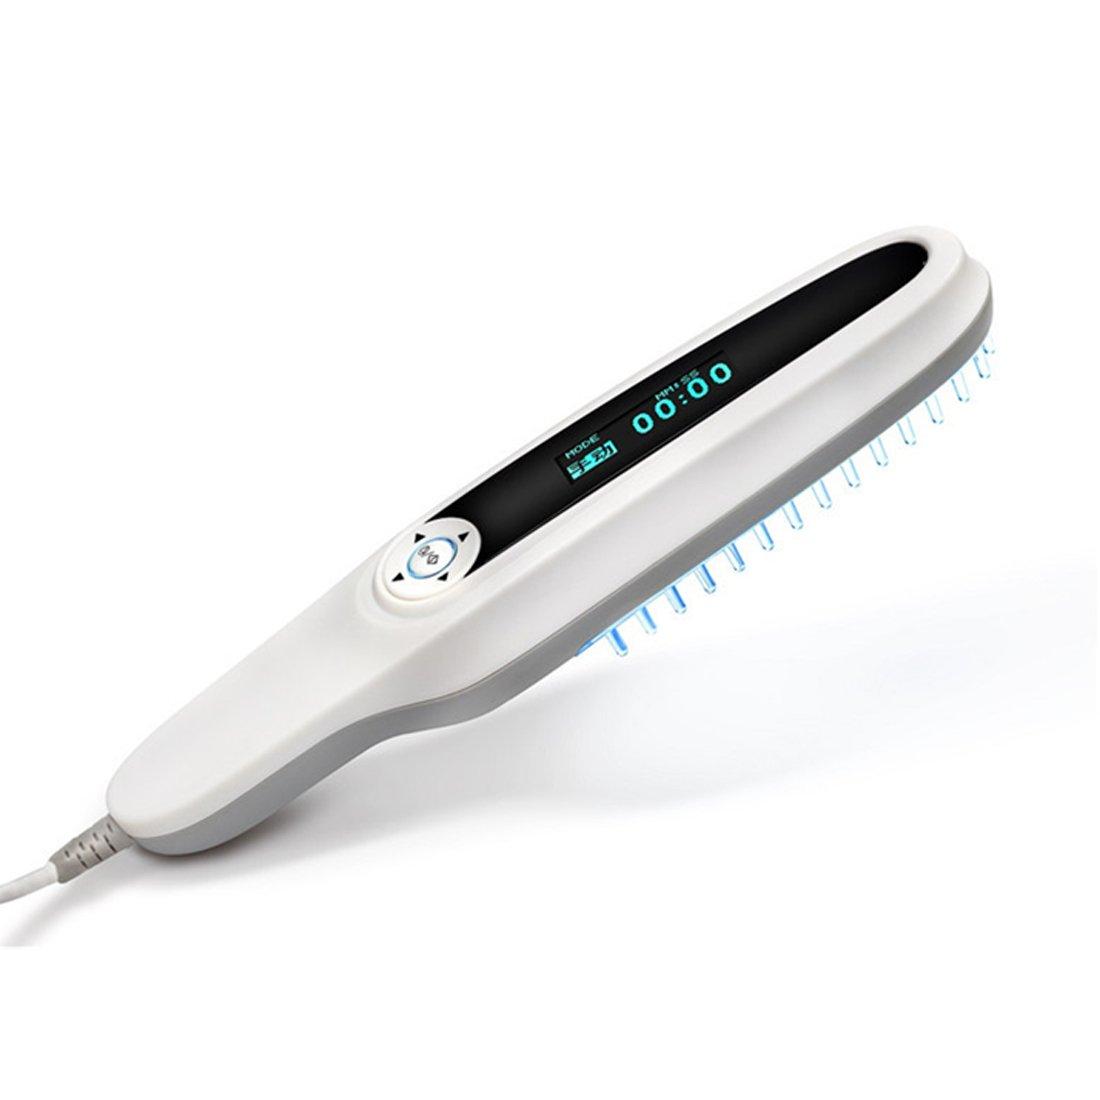 Amazon.com: MQ Portable UV Phototherapy Lamp Home Light Therapy ...